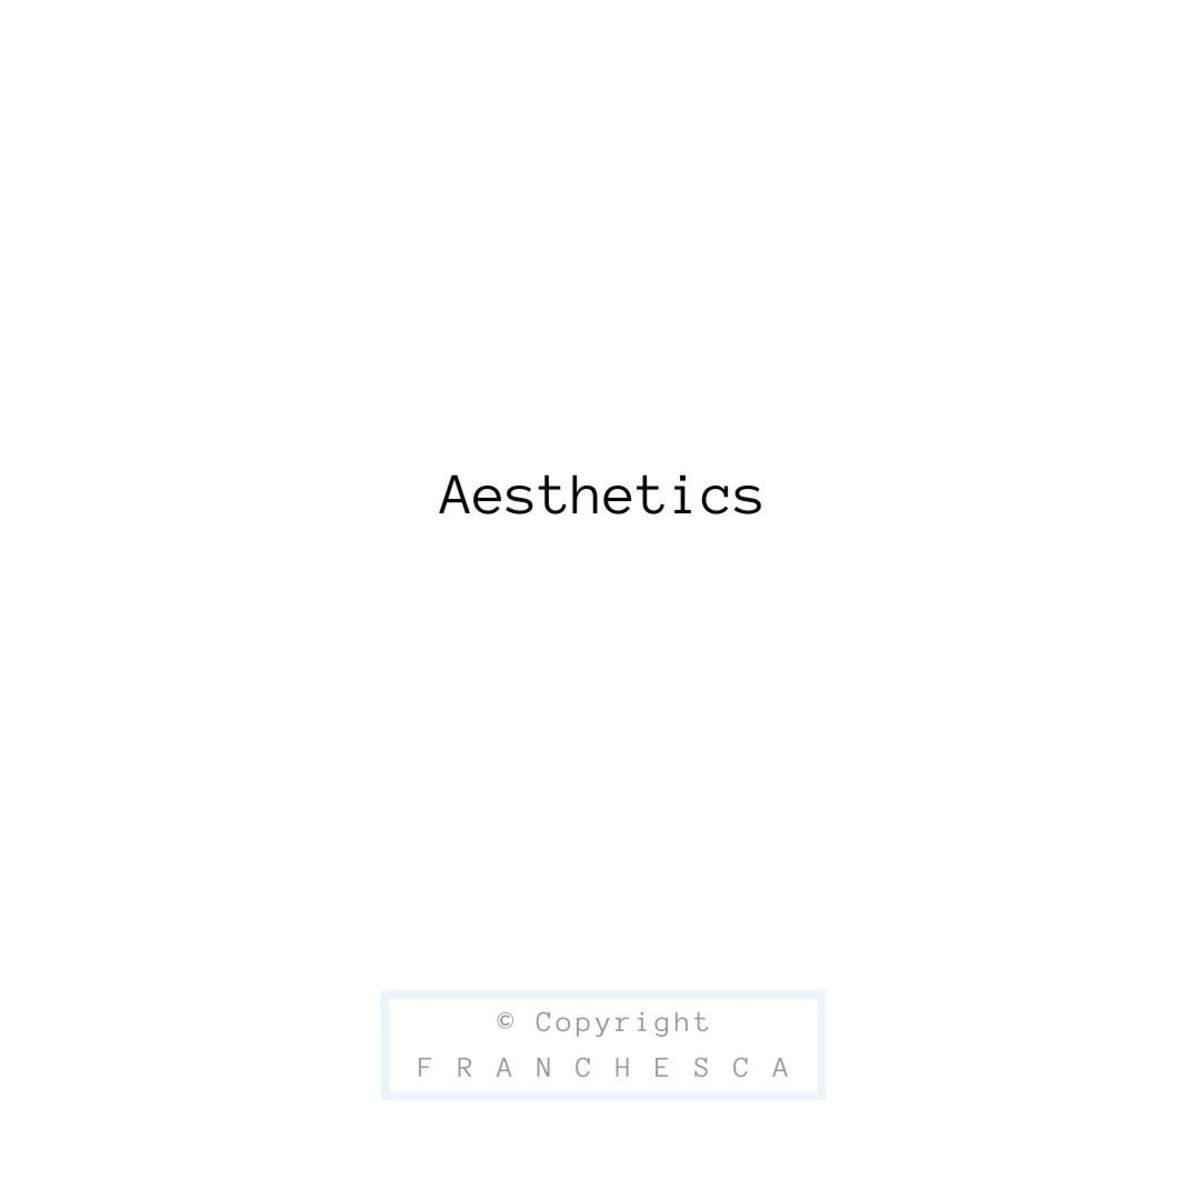 131st Article: Aesthetics